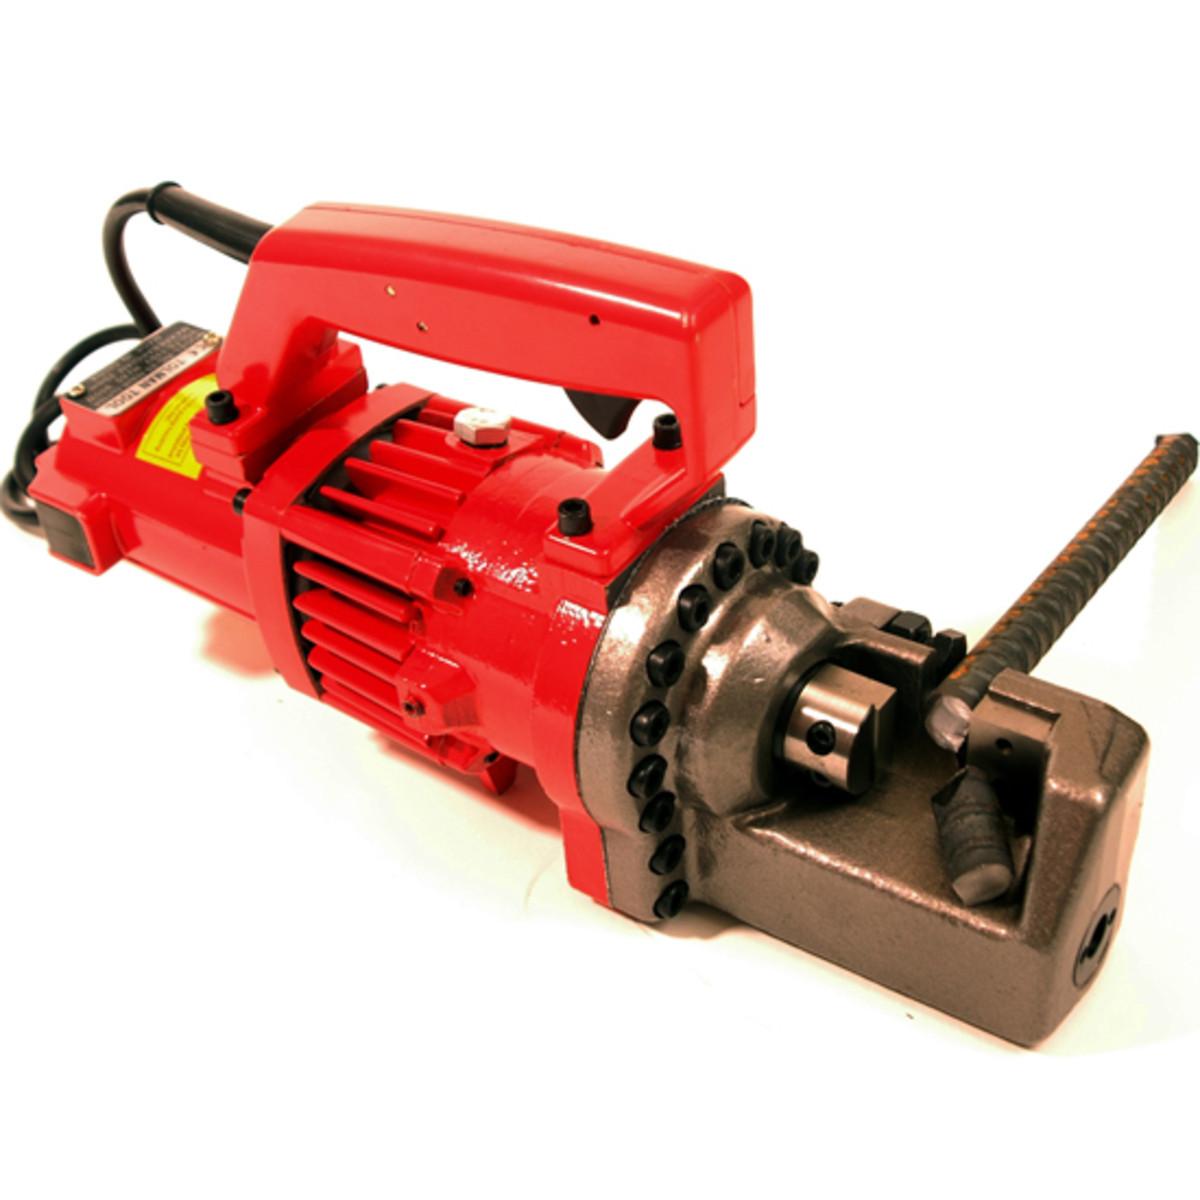 tolman rc 20 electric hydraulic rebar cutter contractors direct. Black Bedroom Furniture Sets. Home Design Ideas